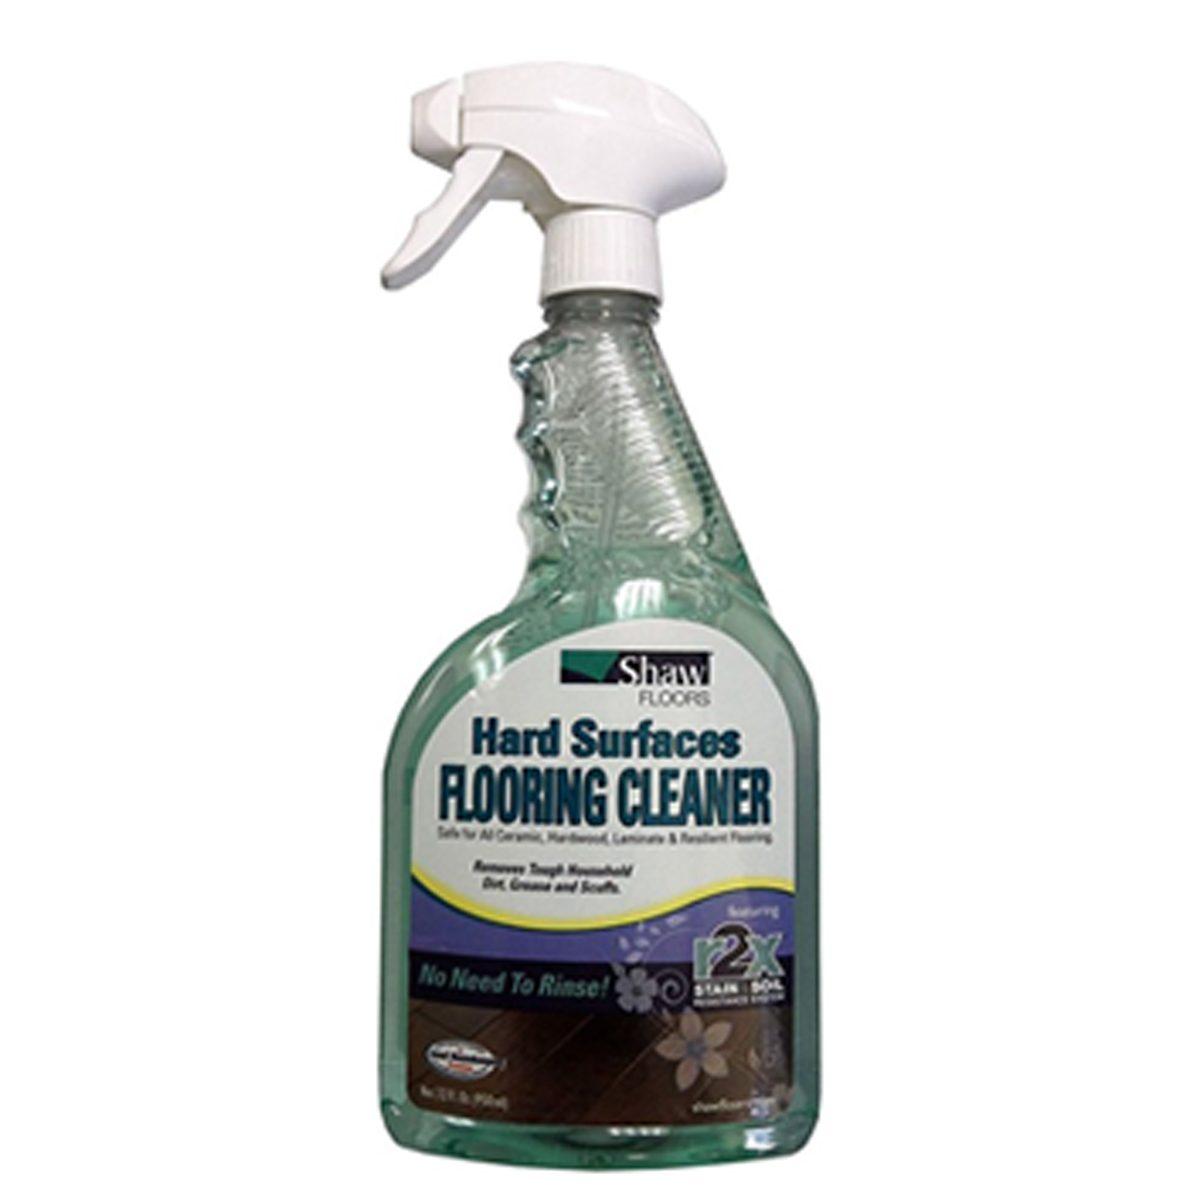 flooring cleaner